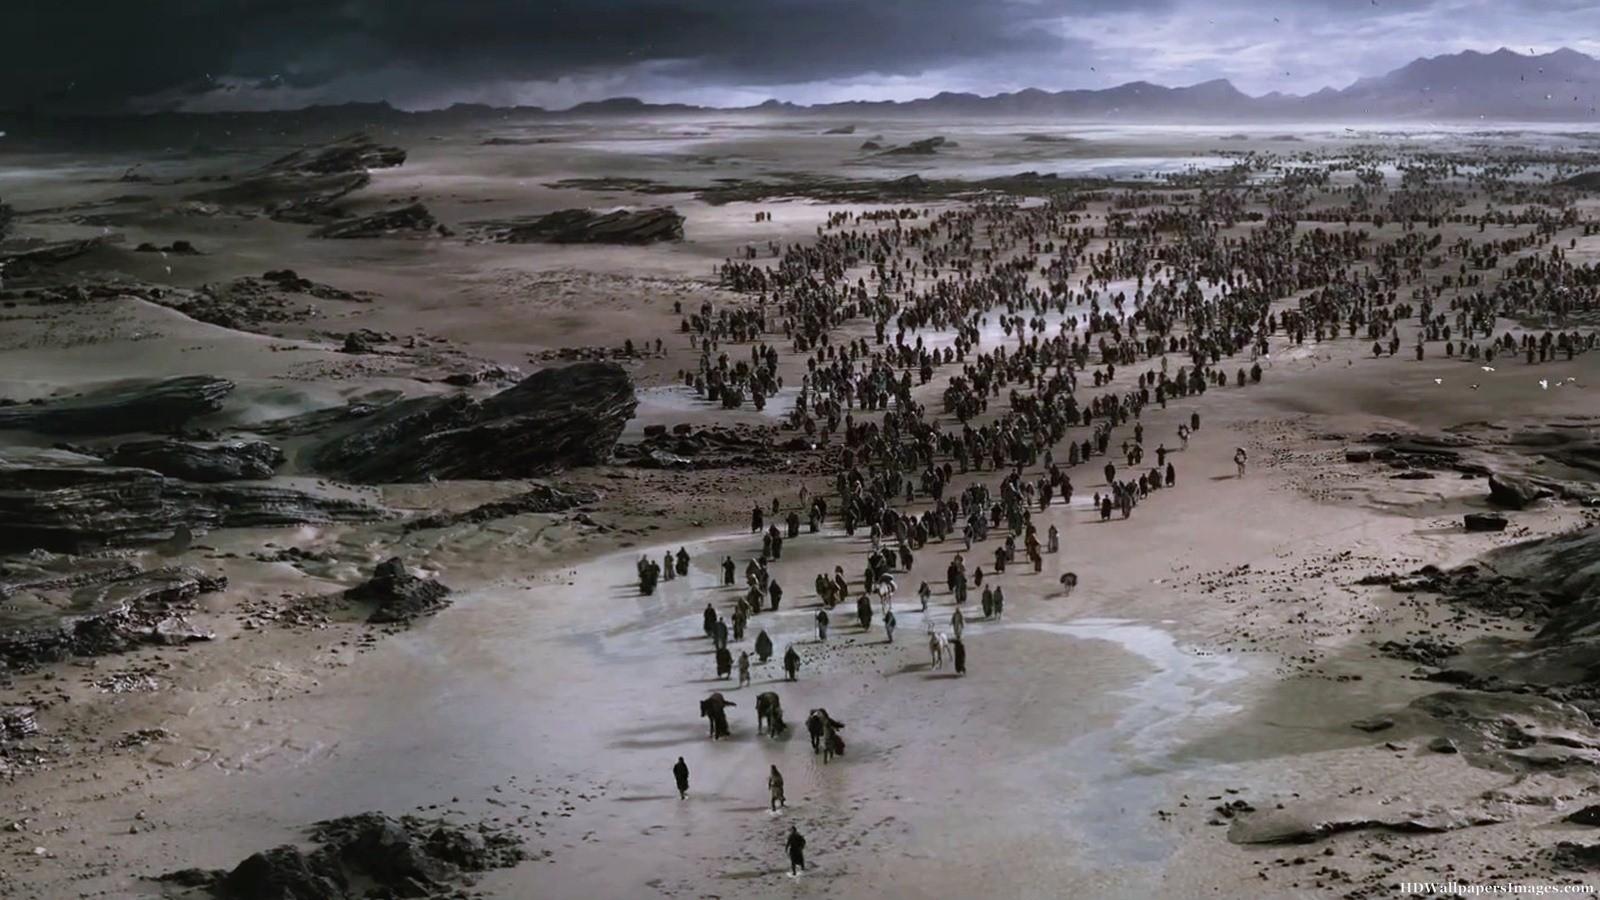 Hundreds of tiny figures of people walking across a barren landscape.